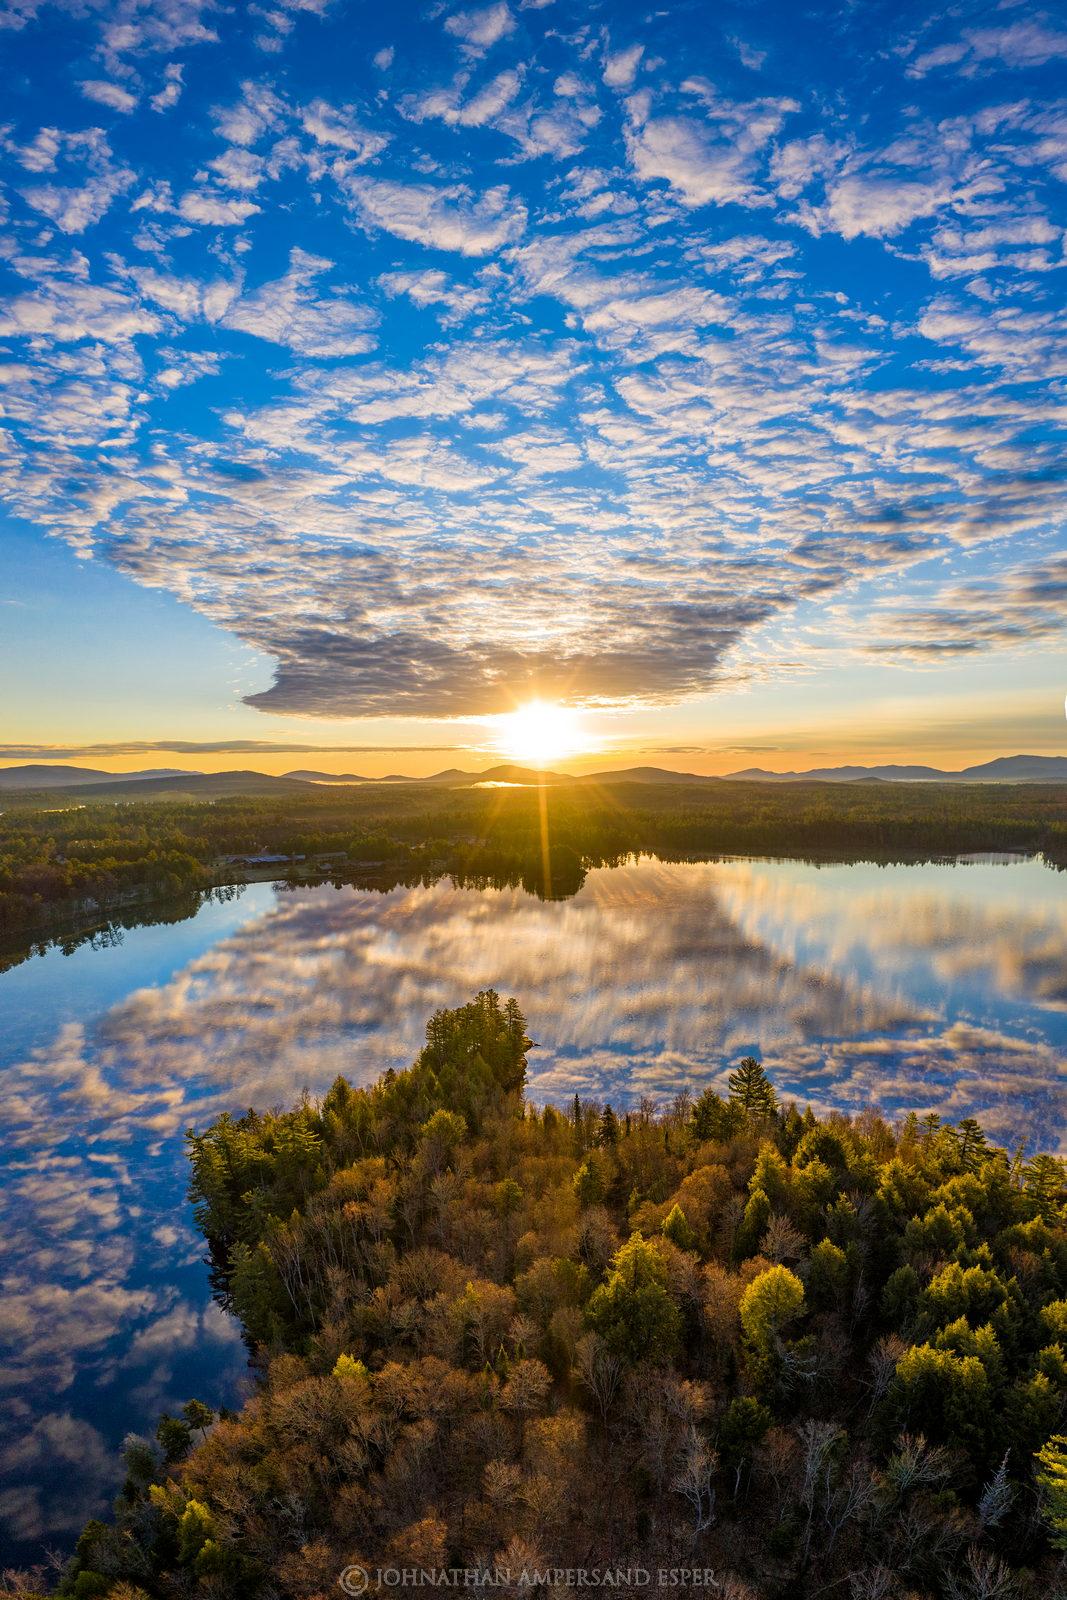 Lower St. Regis Lake,St. Regis Lake,St Regis Lake,Lower St Regis Lake,Paul Smiths,Paul Smiths college,cloud reflection,clouds...